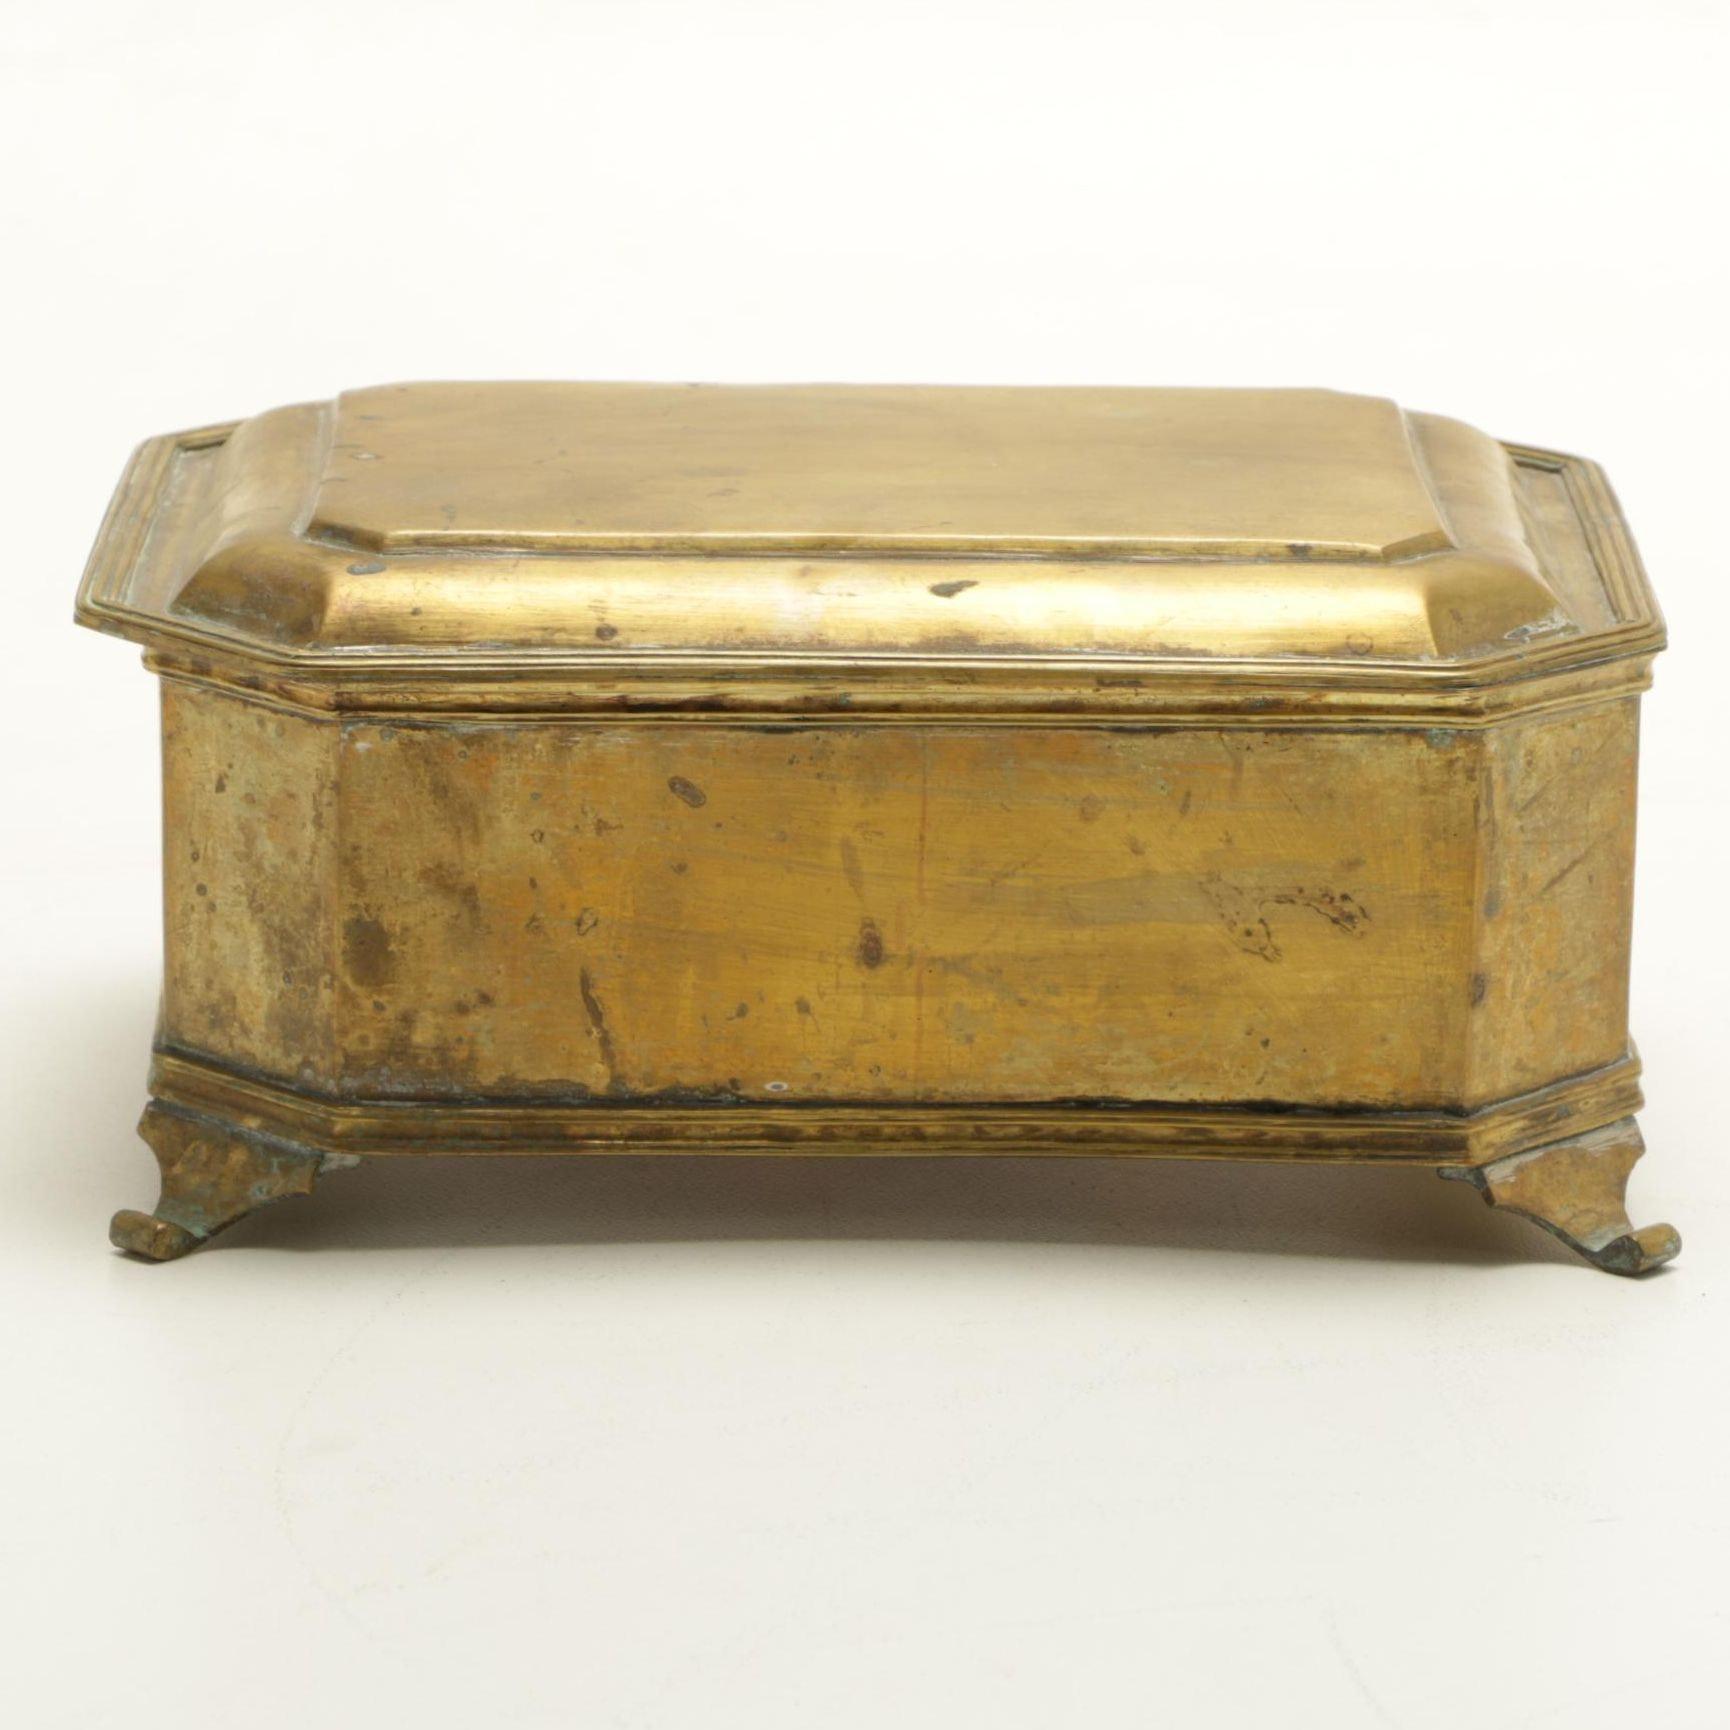 Footed Brass Tea Caddy